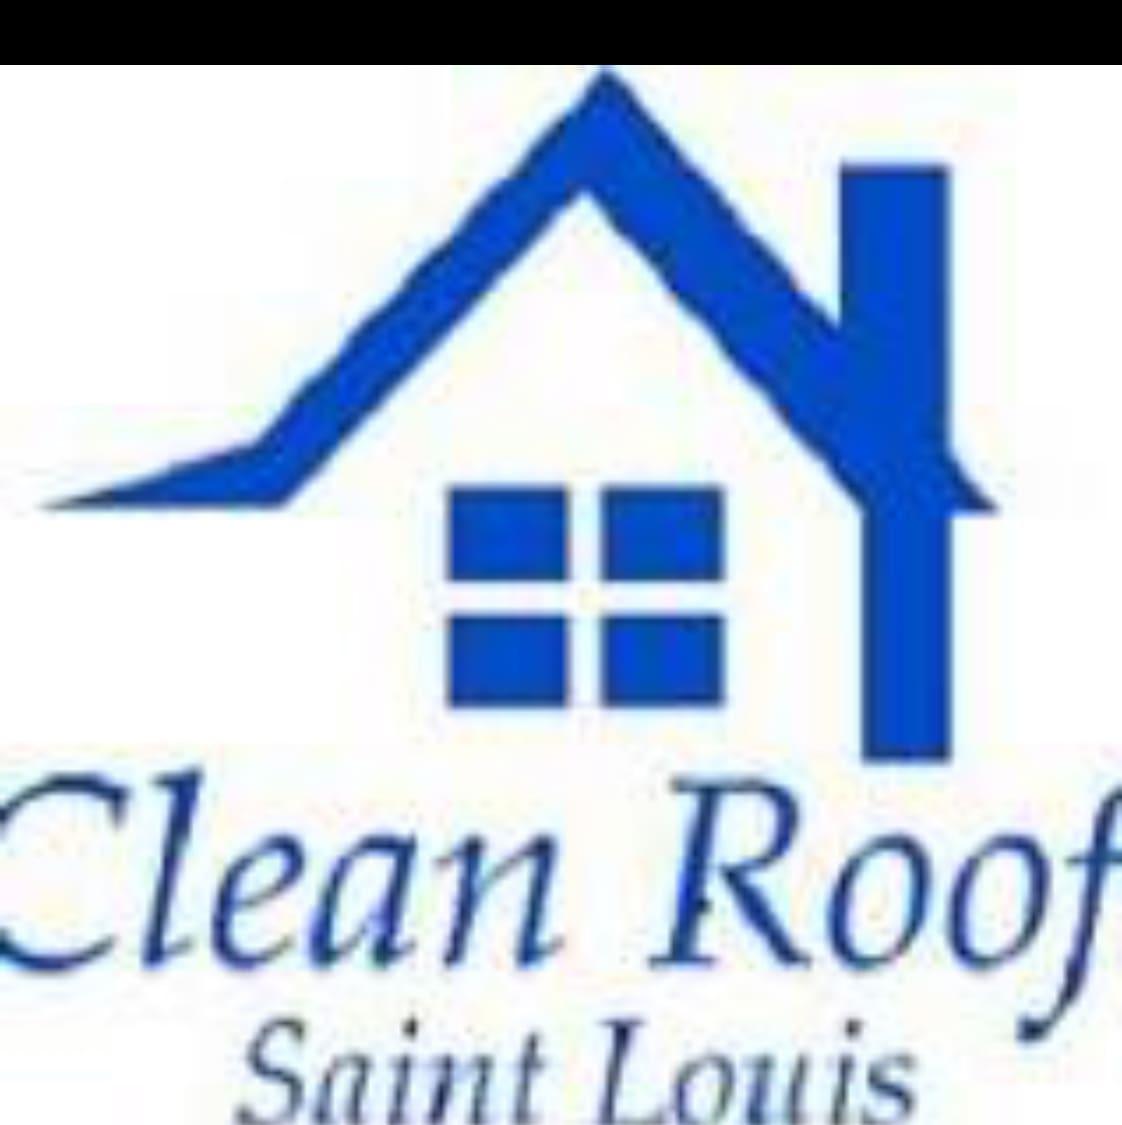 Clean Roof STL logo